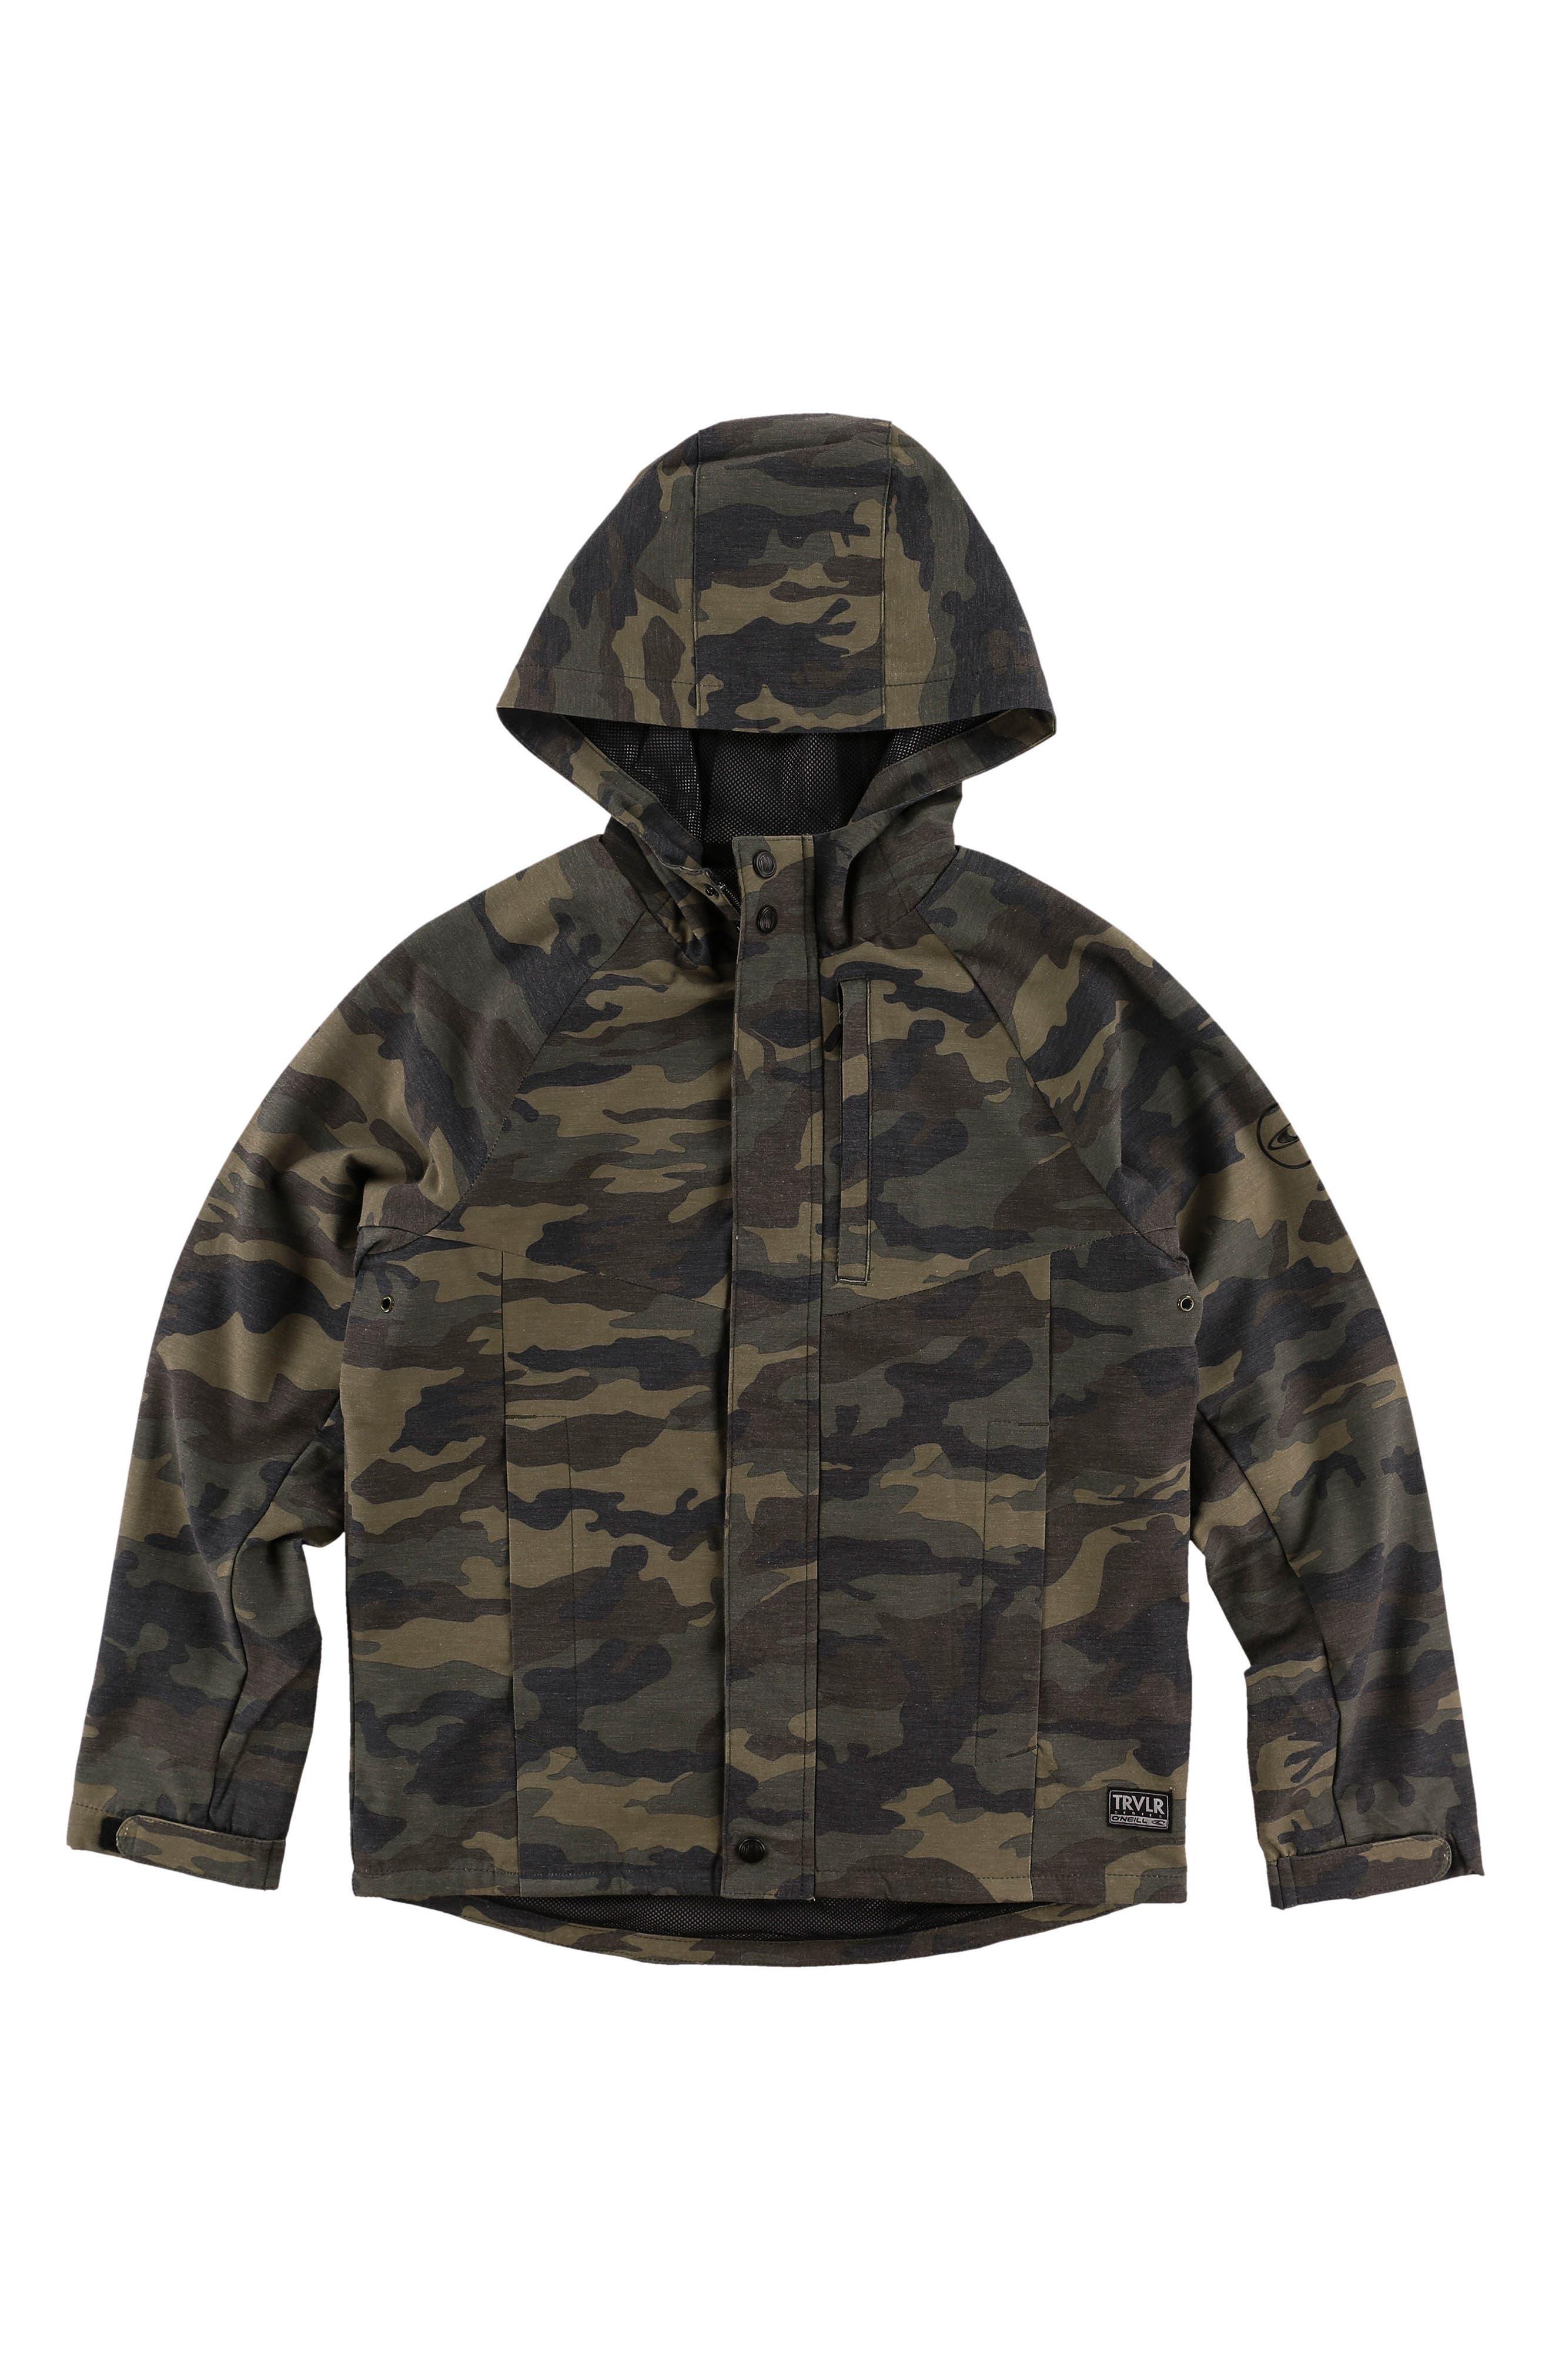 O'Neill Traveler Dawn Patrol Camo Hooded Windbreaker Jacket (Big Boys)